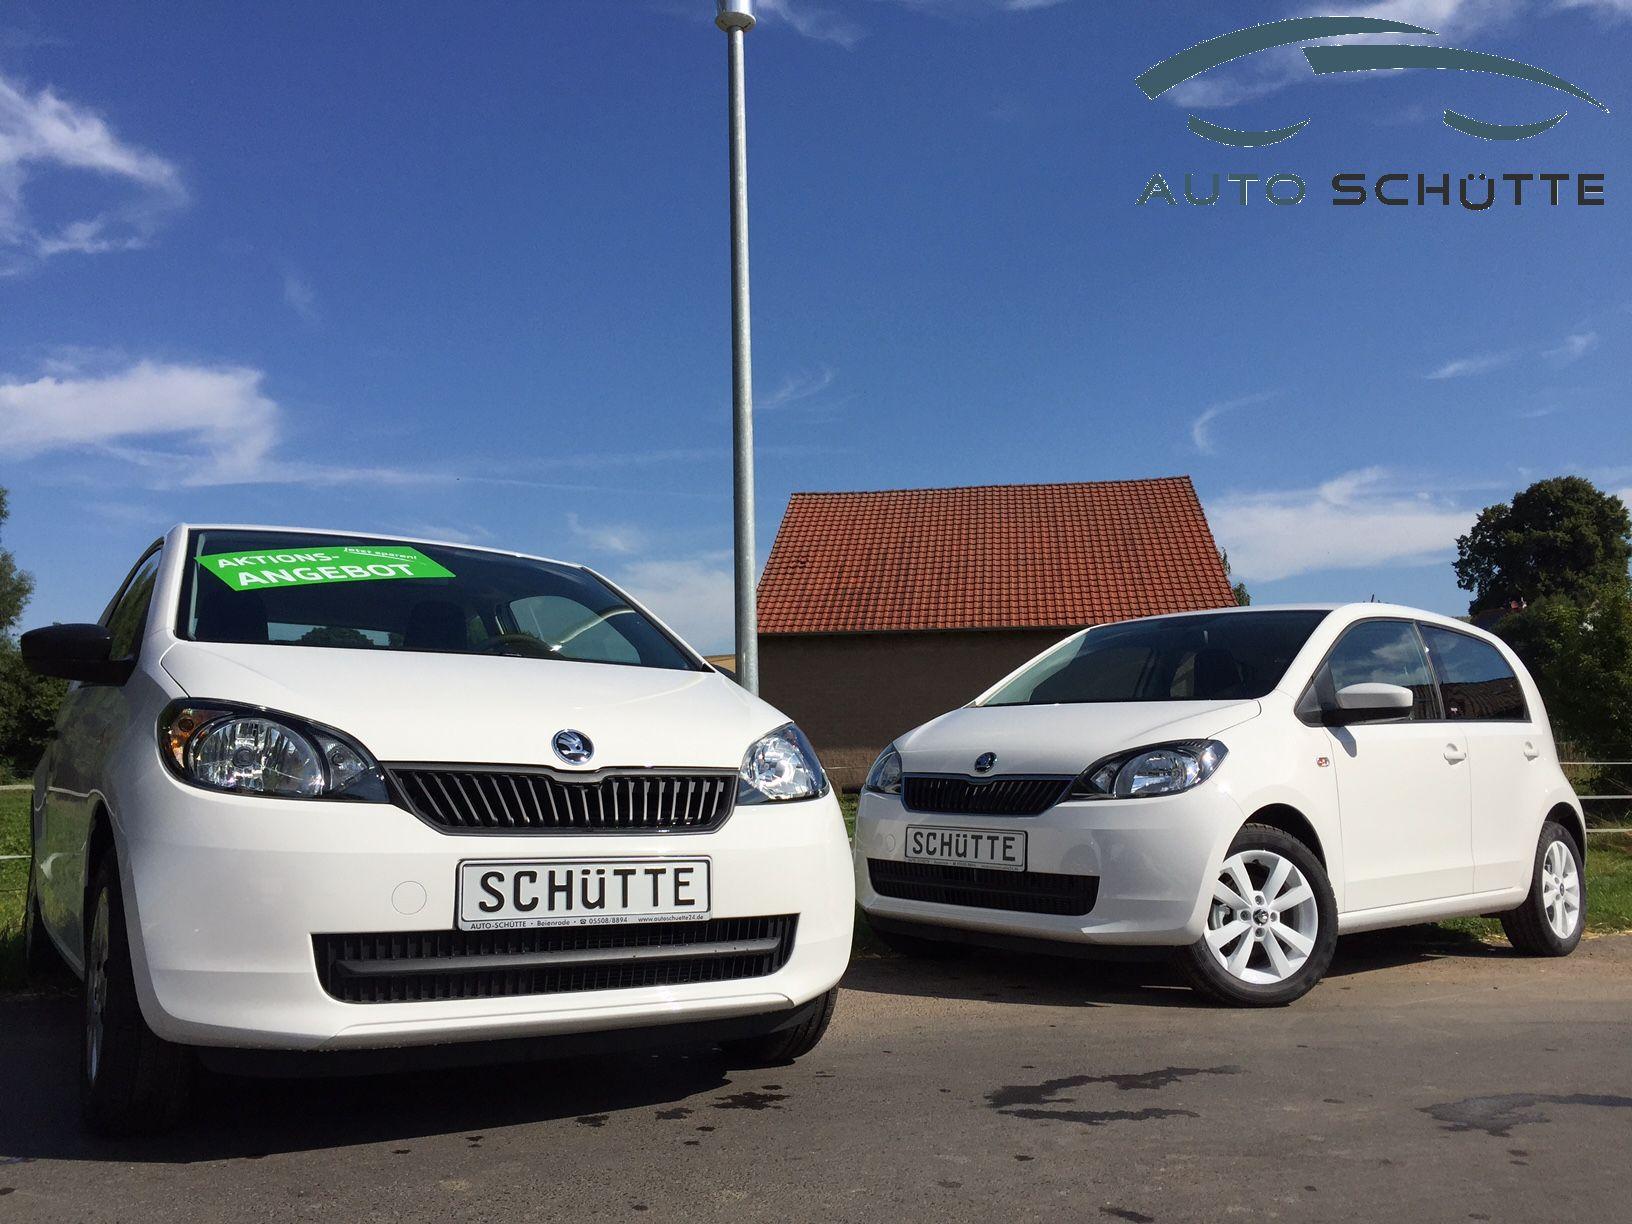 Auto Schütte - Mercedes, Volkswagen, Audi, Opel | Home